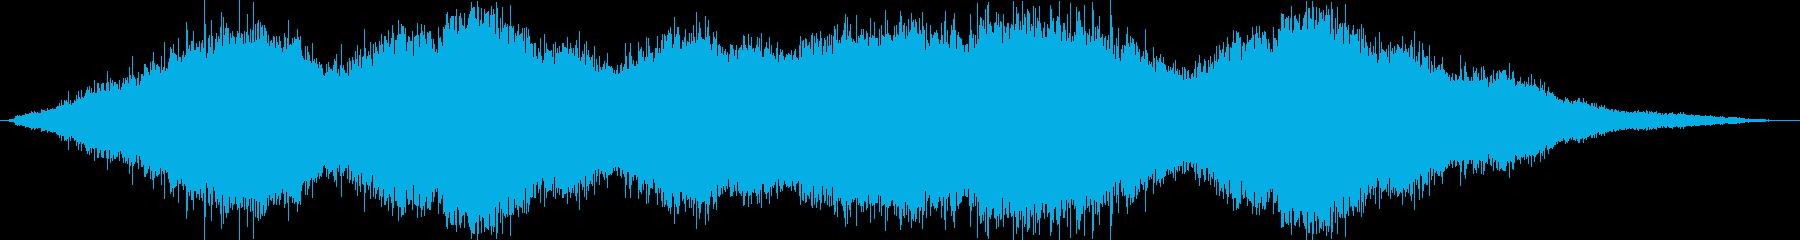 PADS 重い波01の再生済みの波形